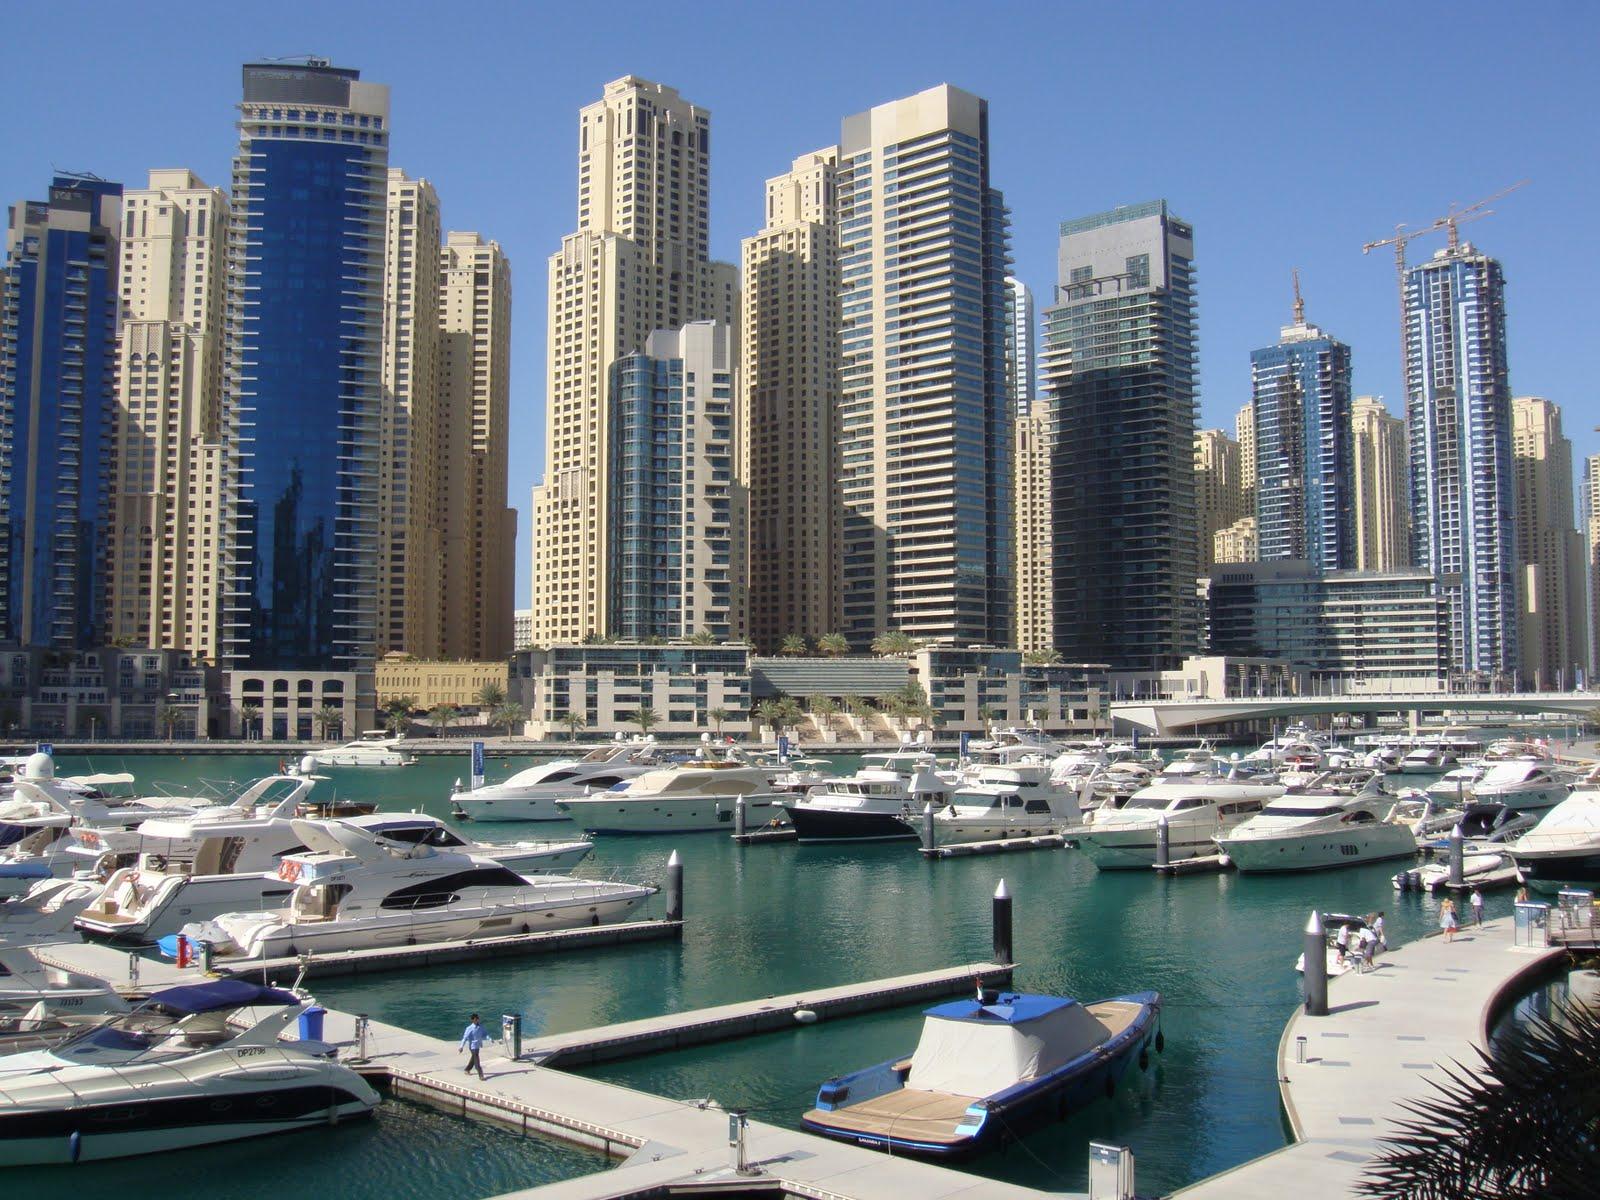 Amazing And Beautiful Pictures Photos Amazing Pictures Beautiful Dubai Marina